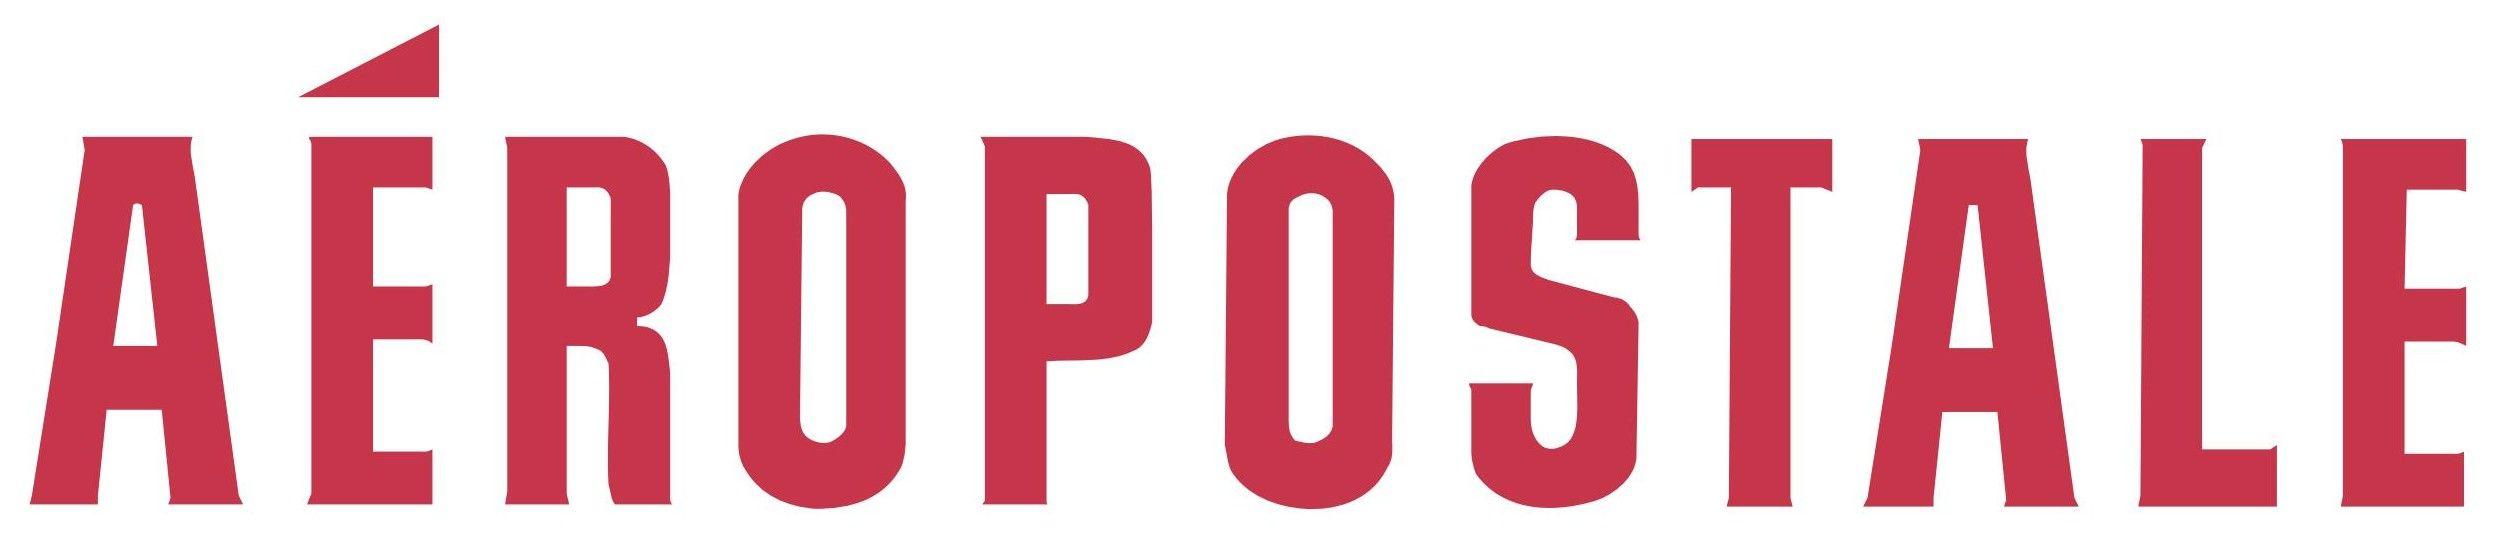 Aéropostale Logo [EPS File] Vector EPS Free Download, Logo, Icons, Brand Emblems